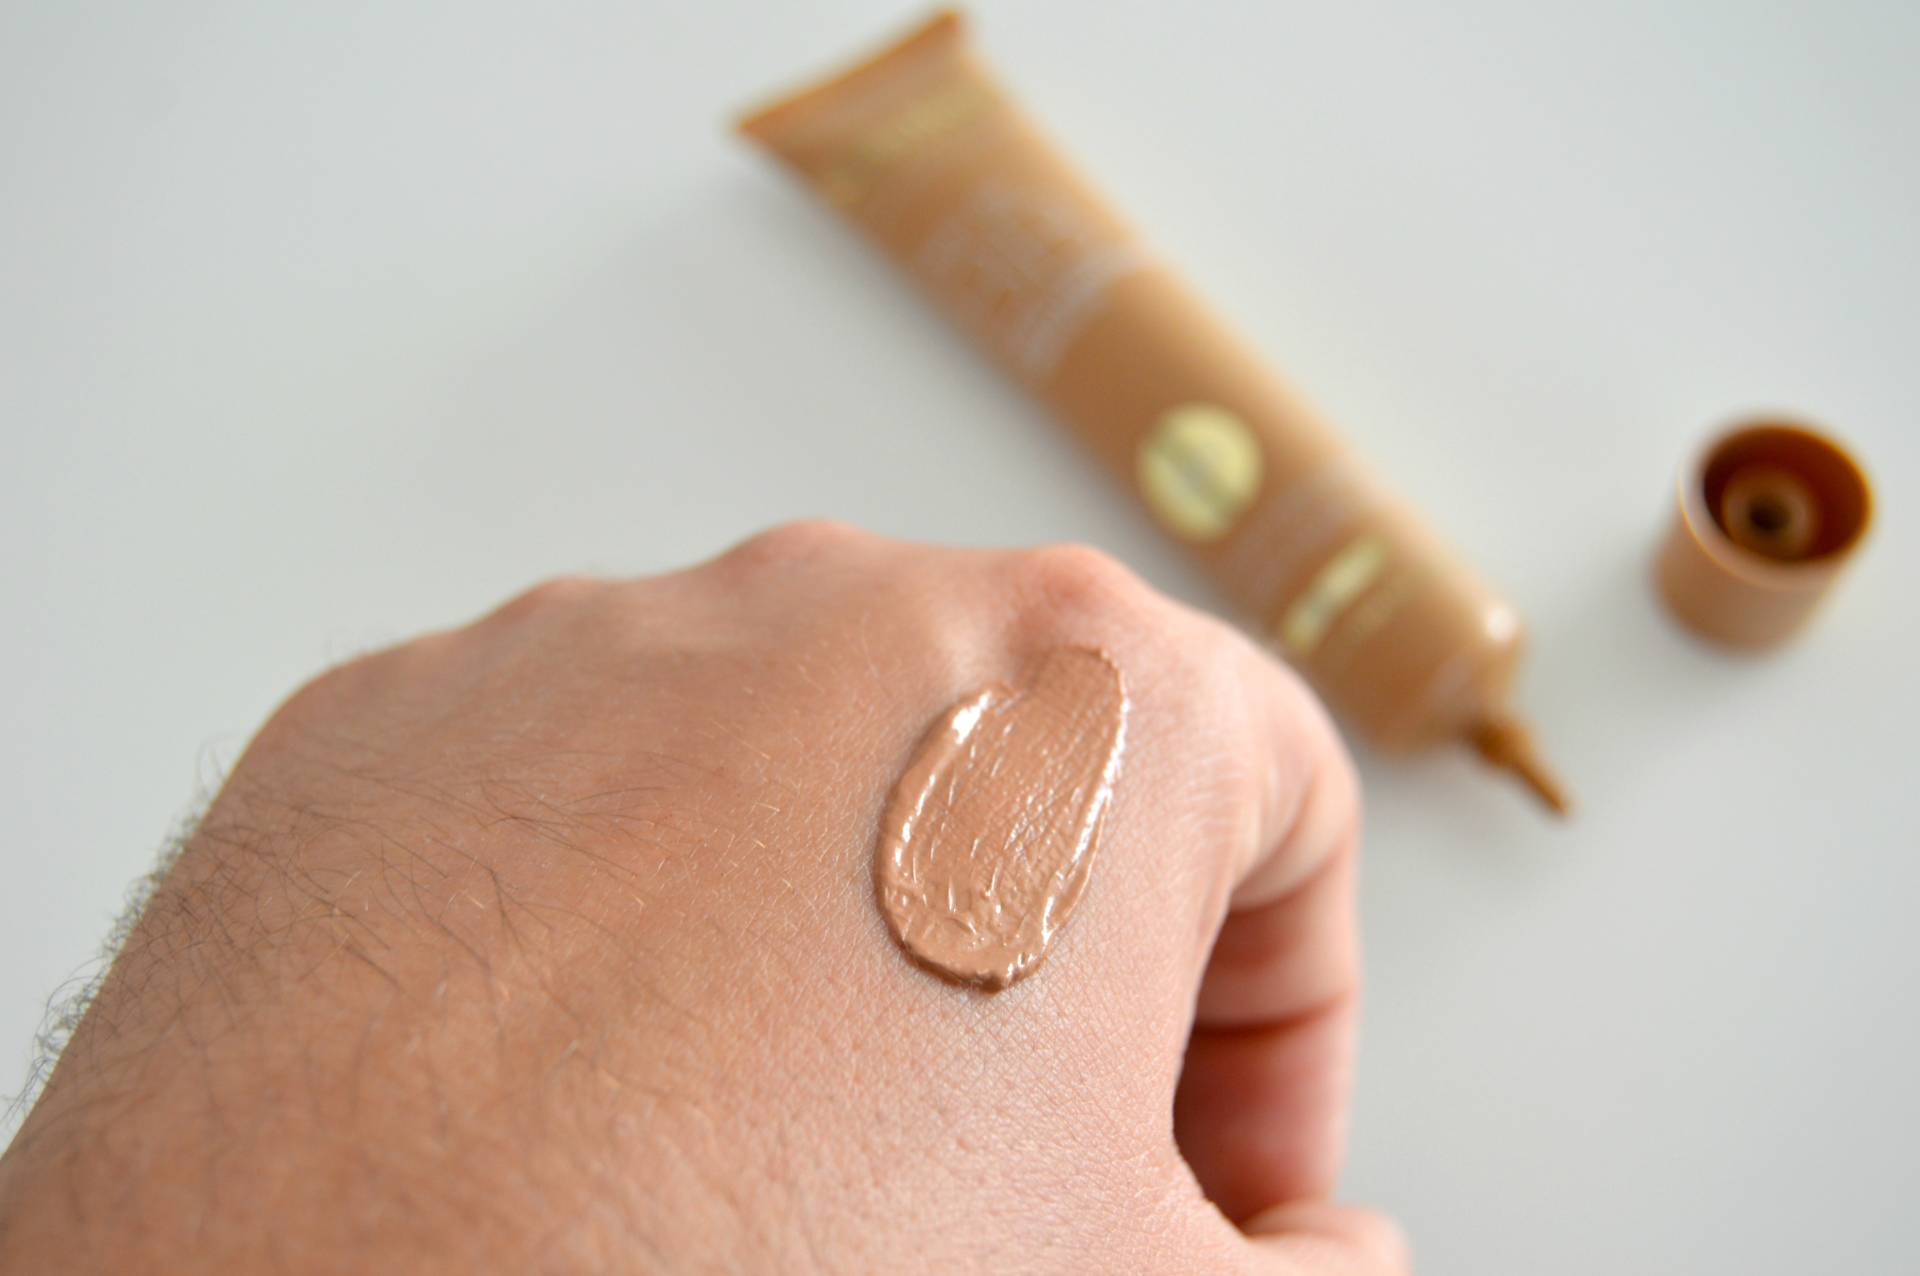 karin herzog new bb cream swatch medium shade inhautepursuit review promo discount code